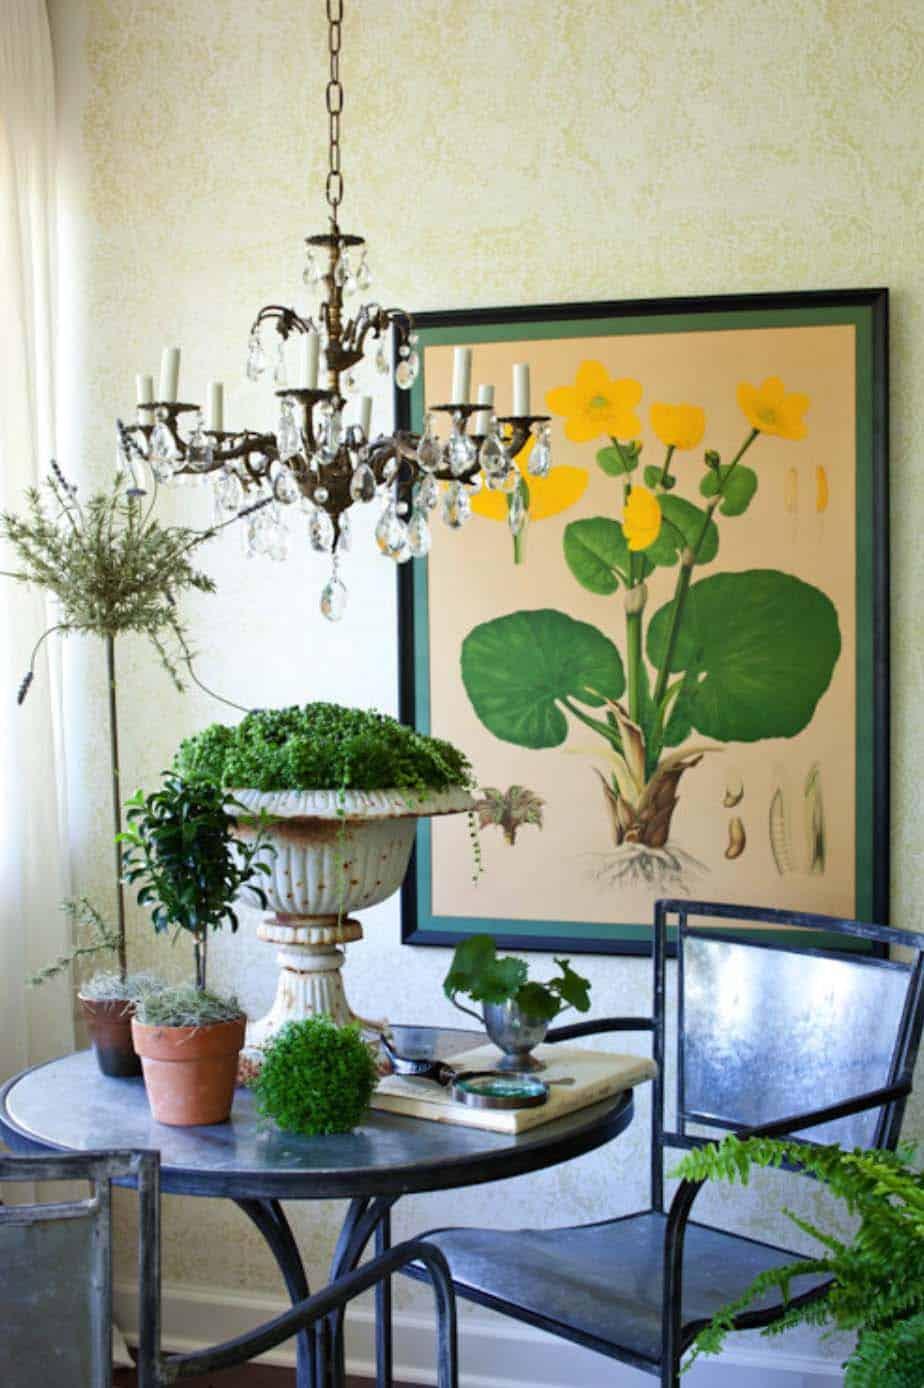 bi-level-home-renovation-lauren-liess-interiors-06-1-kindesign